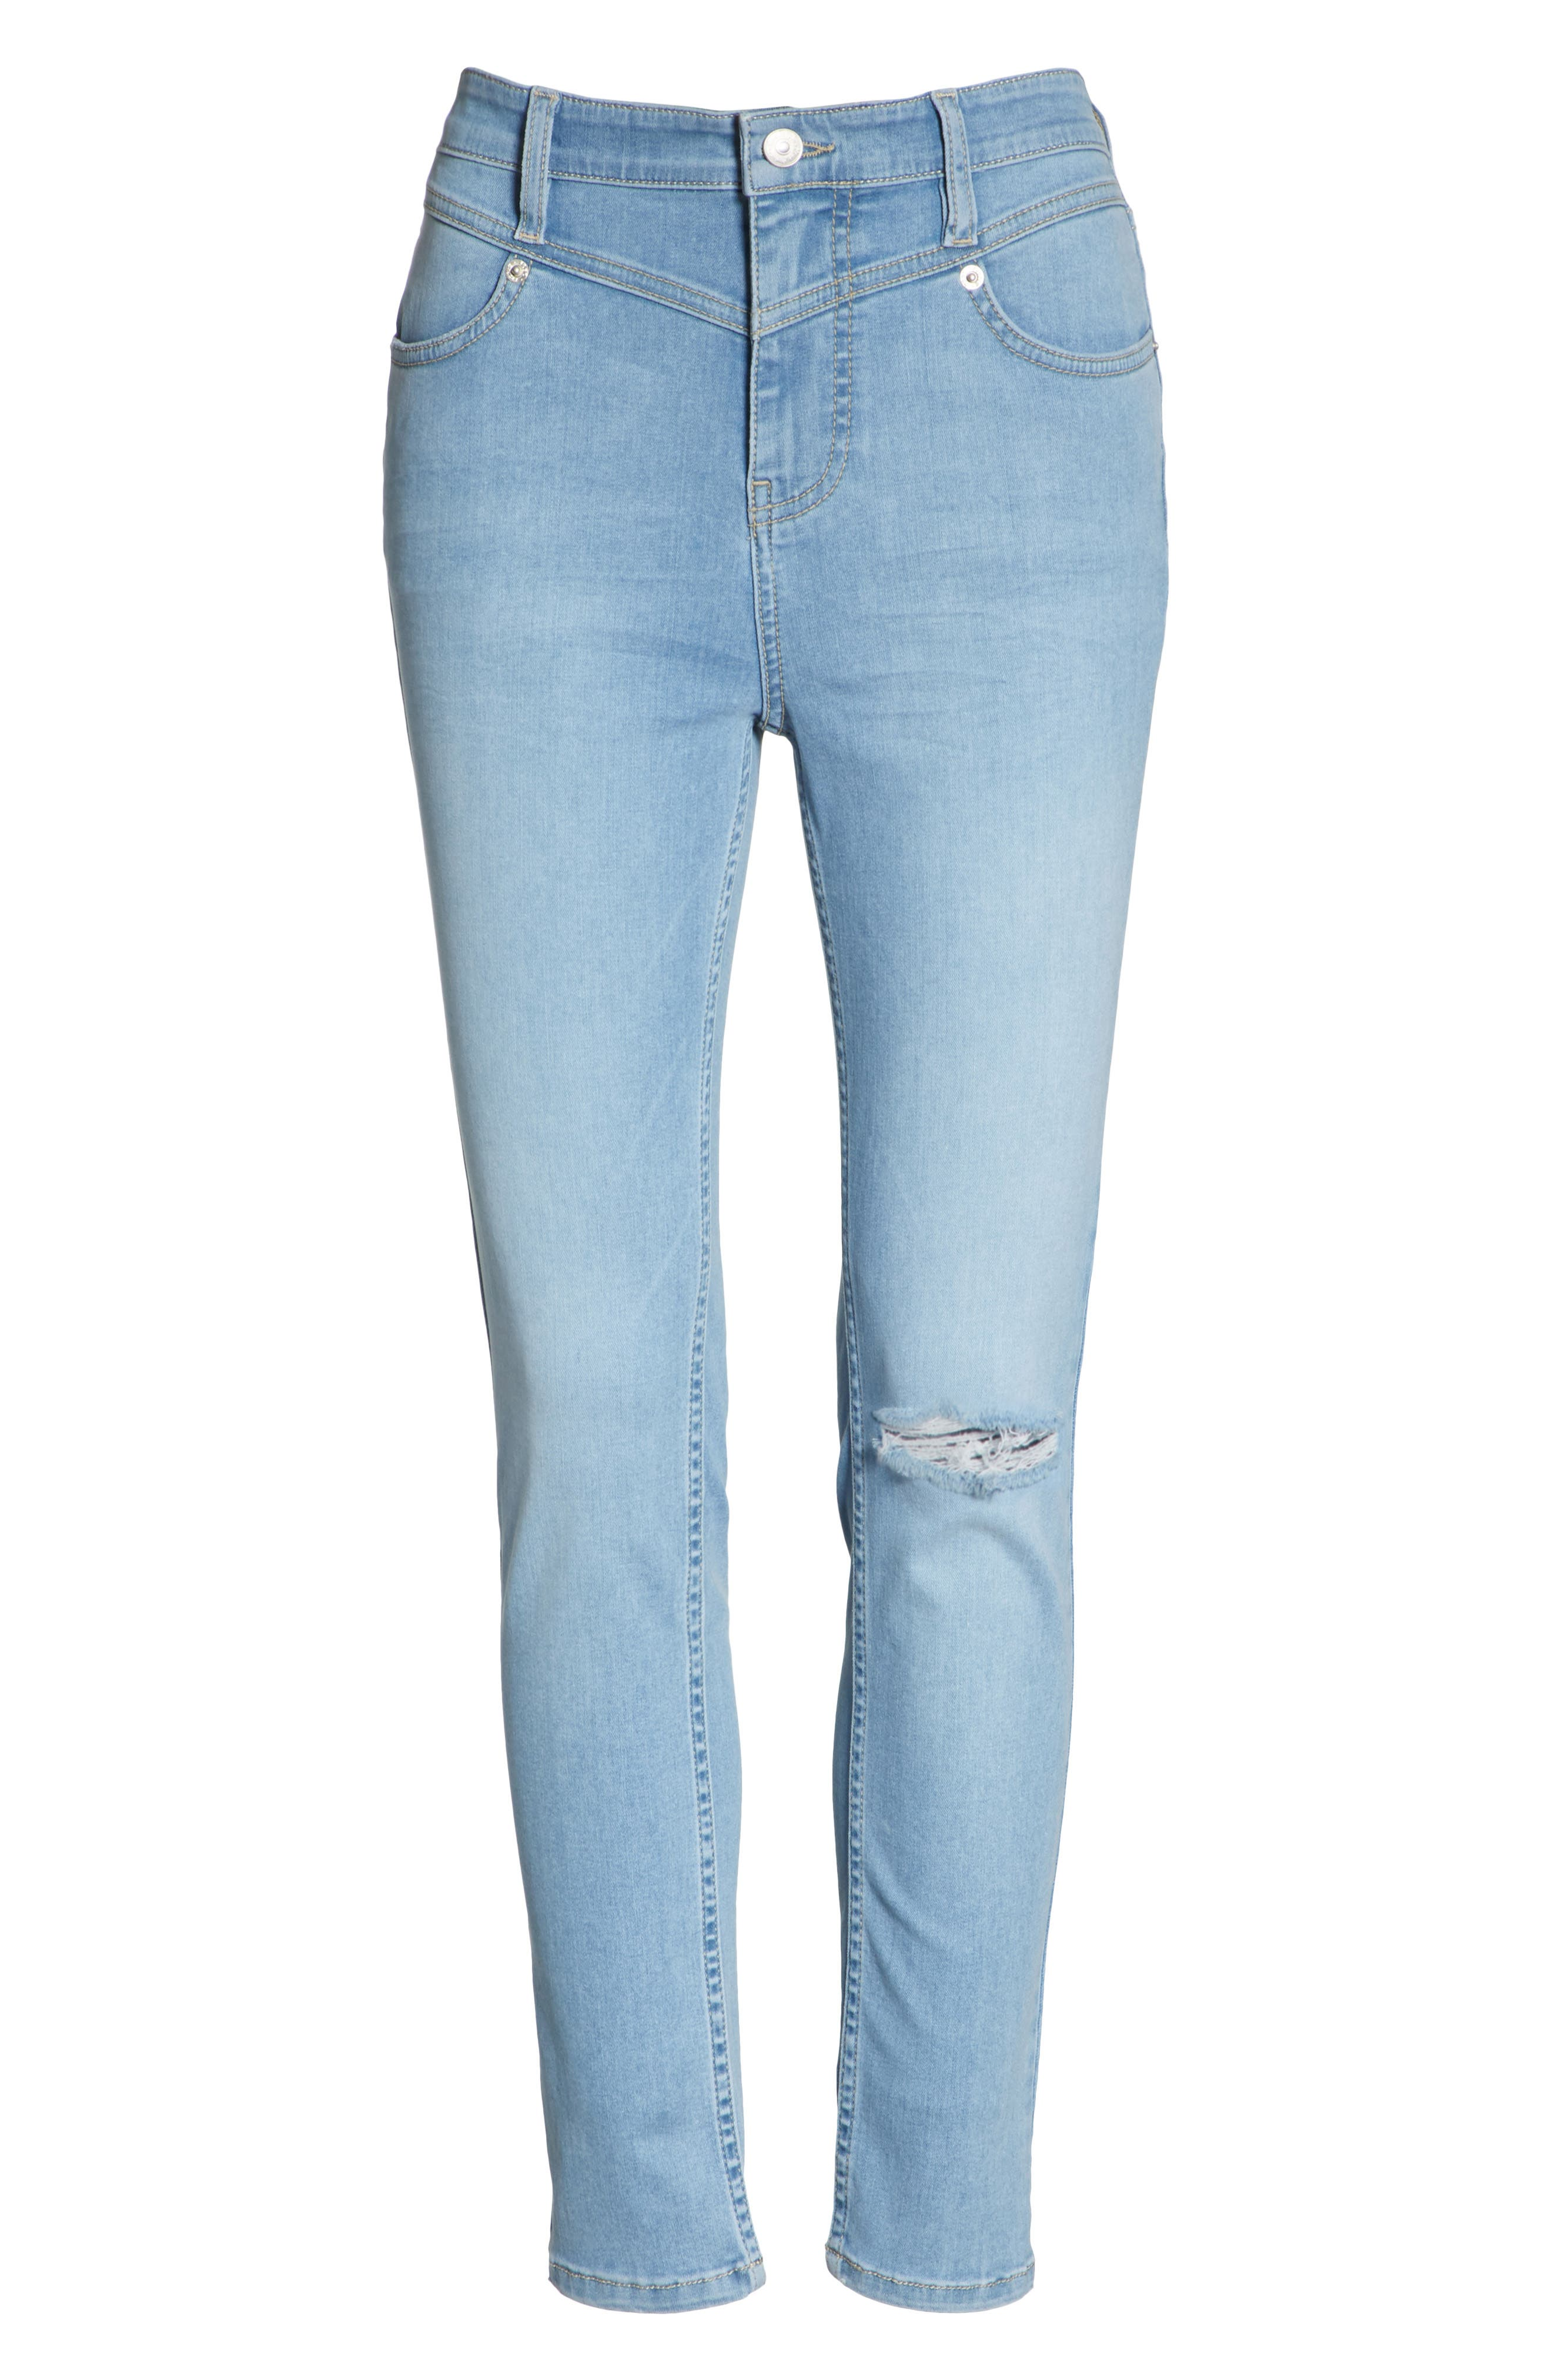 Mara Skinny Jeans,                             Alternate thumbnail 6, color,                             400